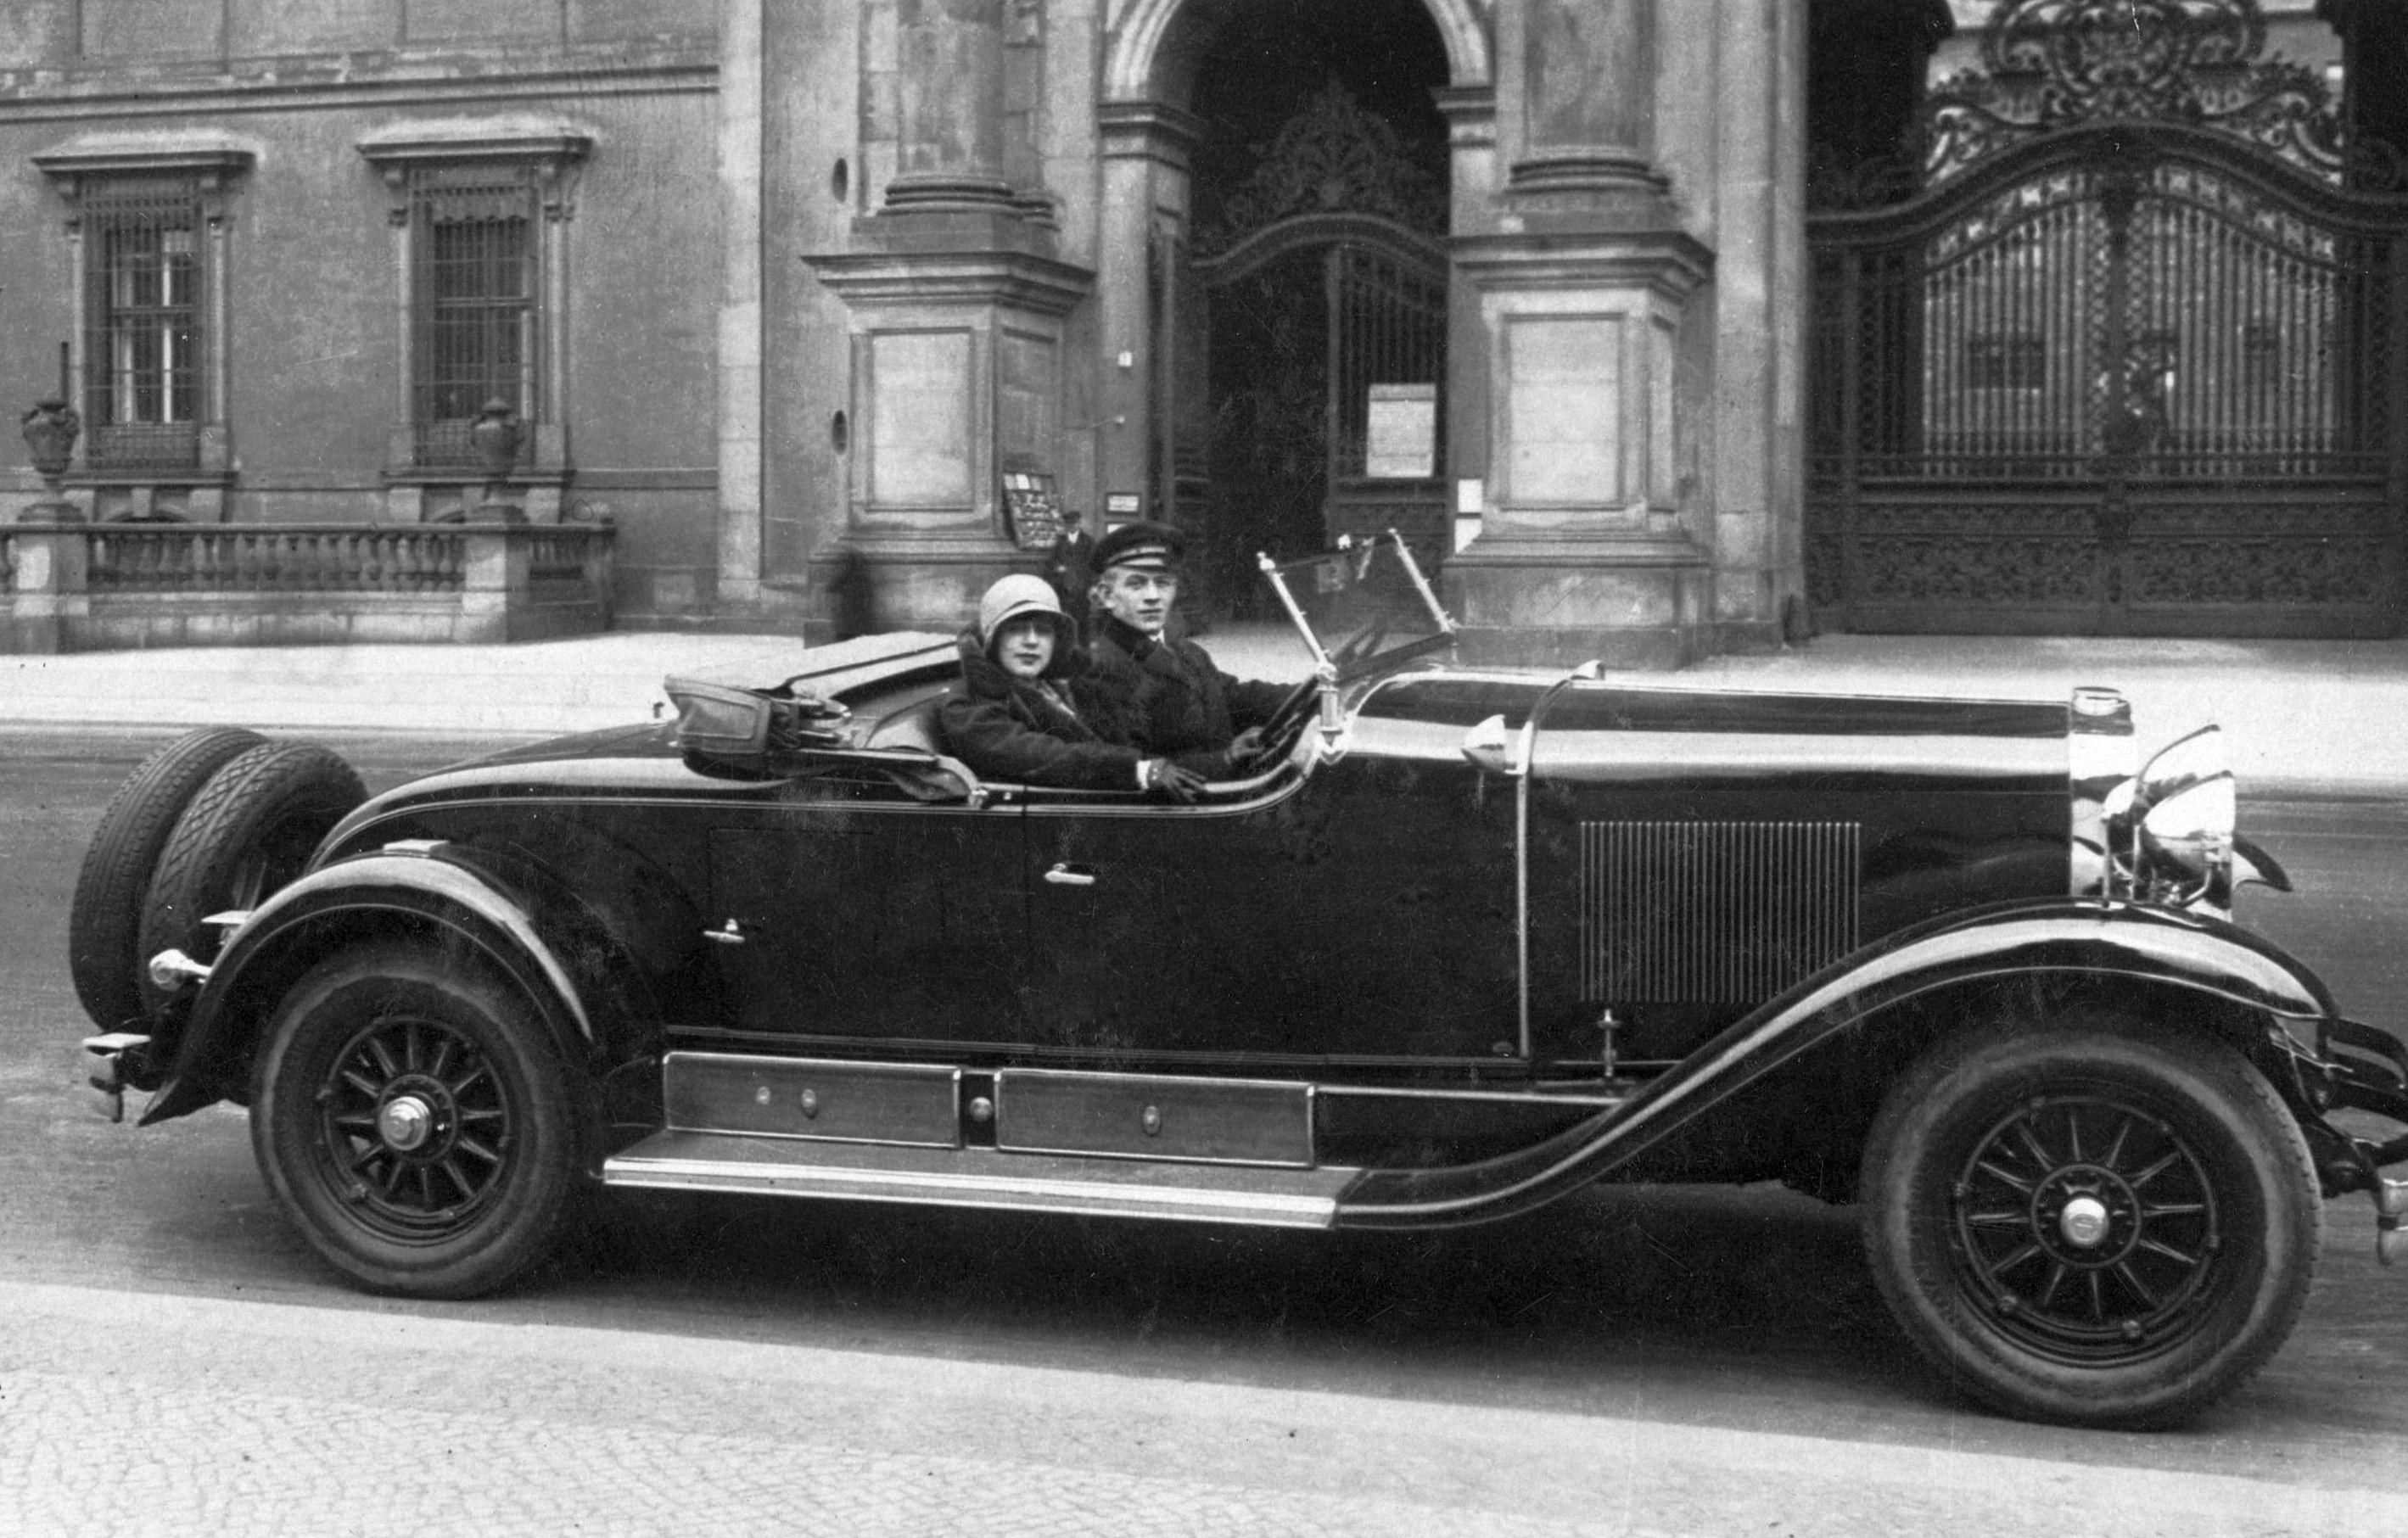 Cadillac_1928_Wien_230429_Galerie